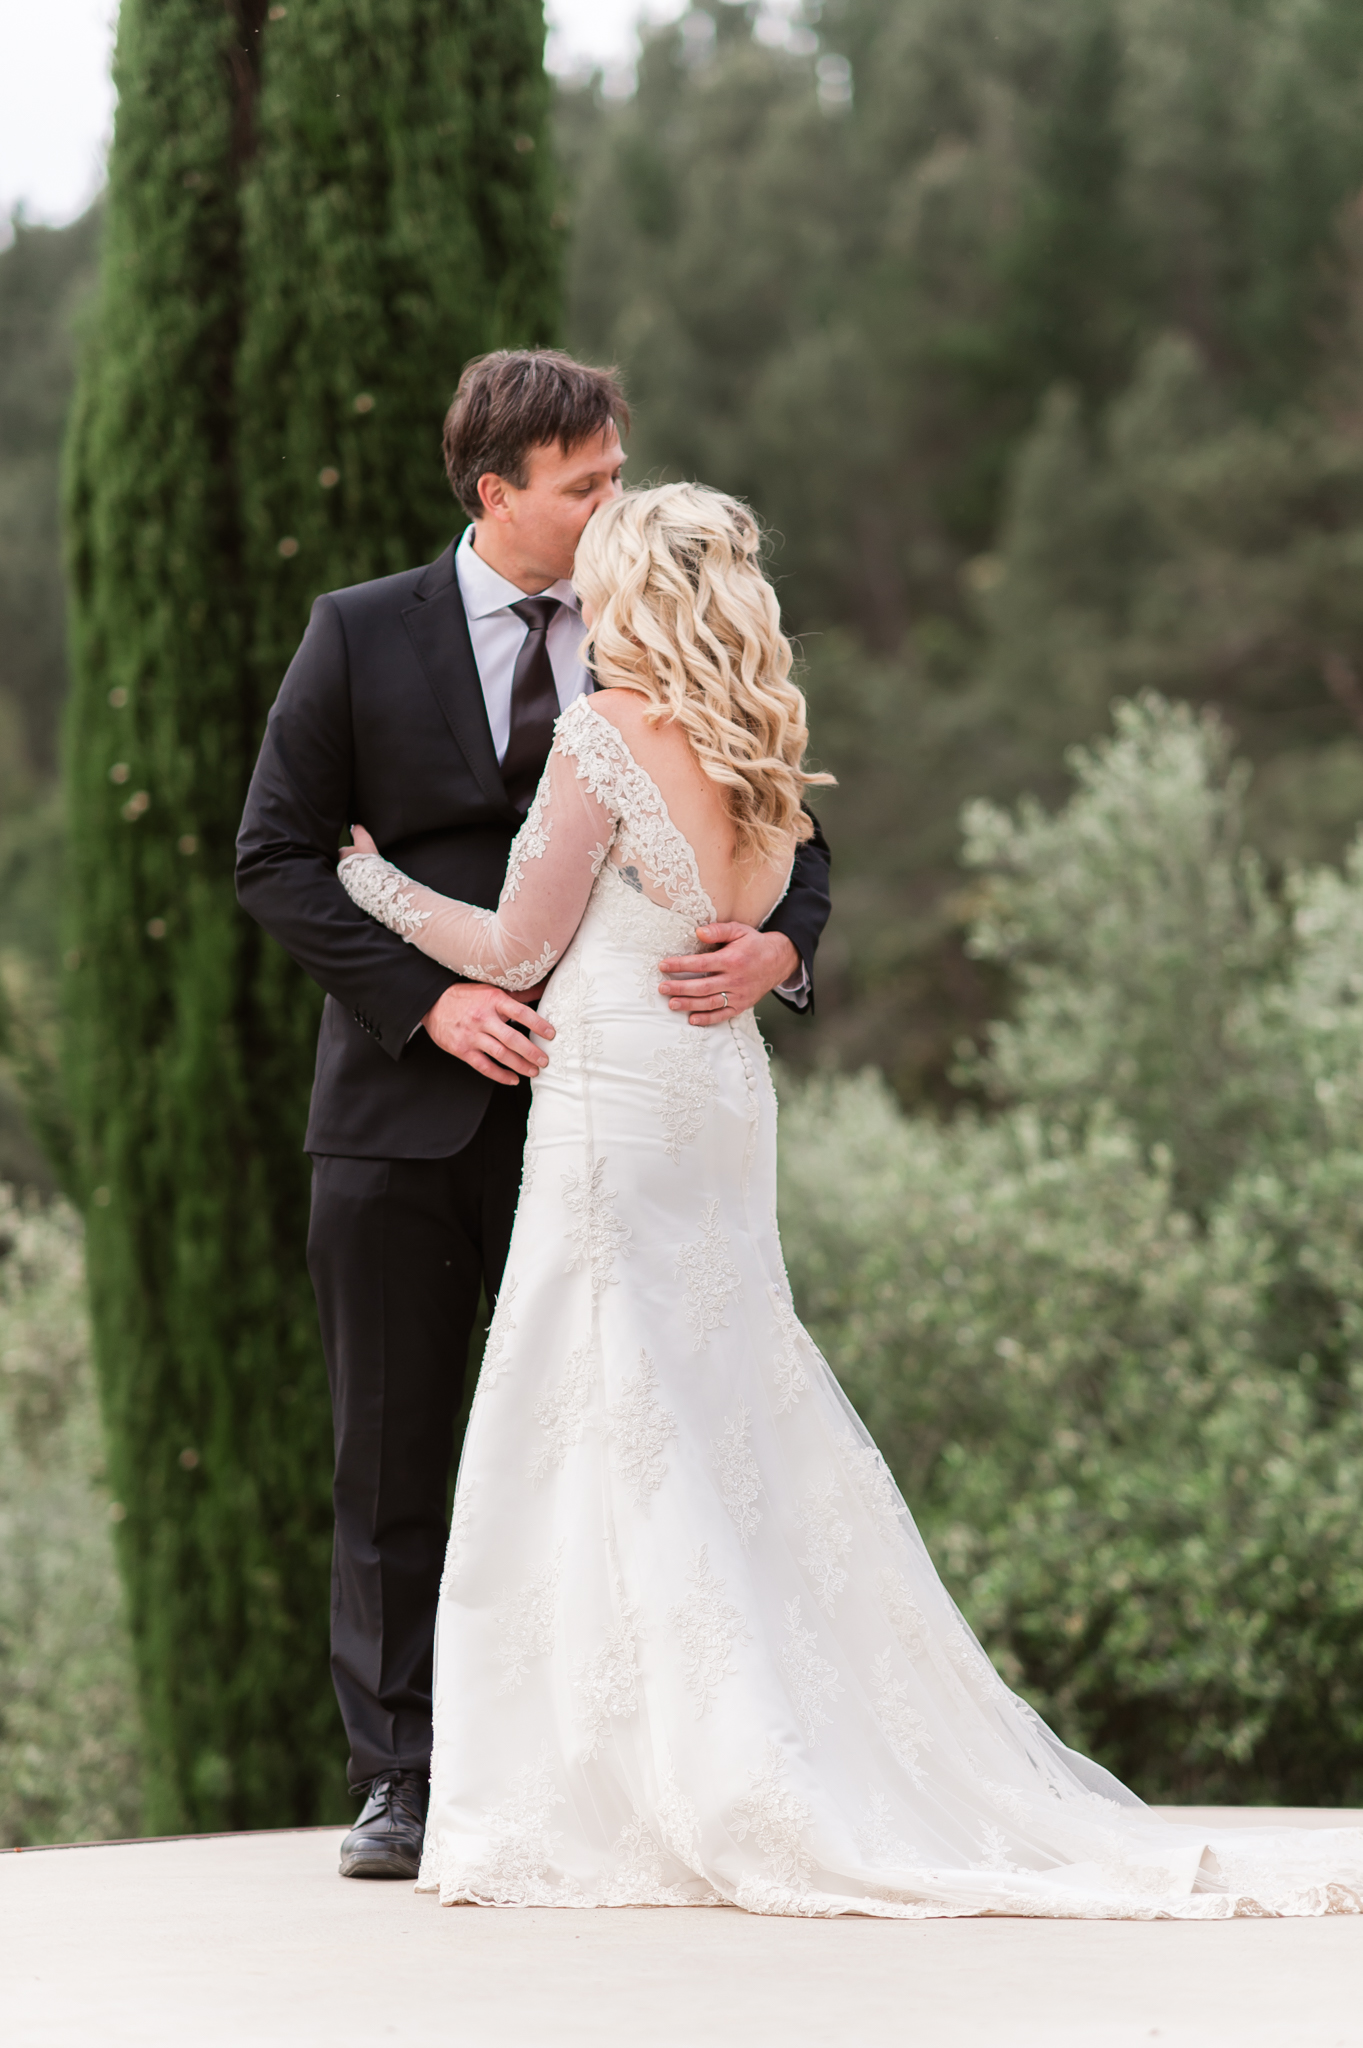 Angelique_Smith_Photography_Pieter&Yvonne_Wedding-460.jpg